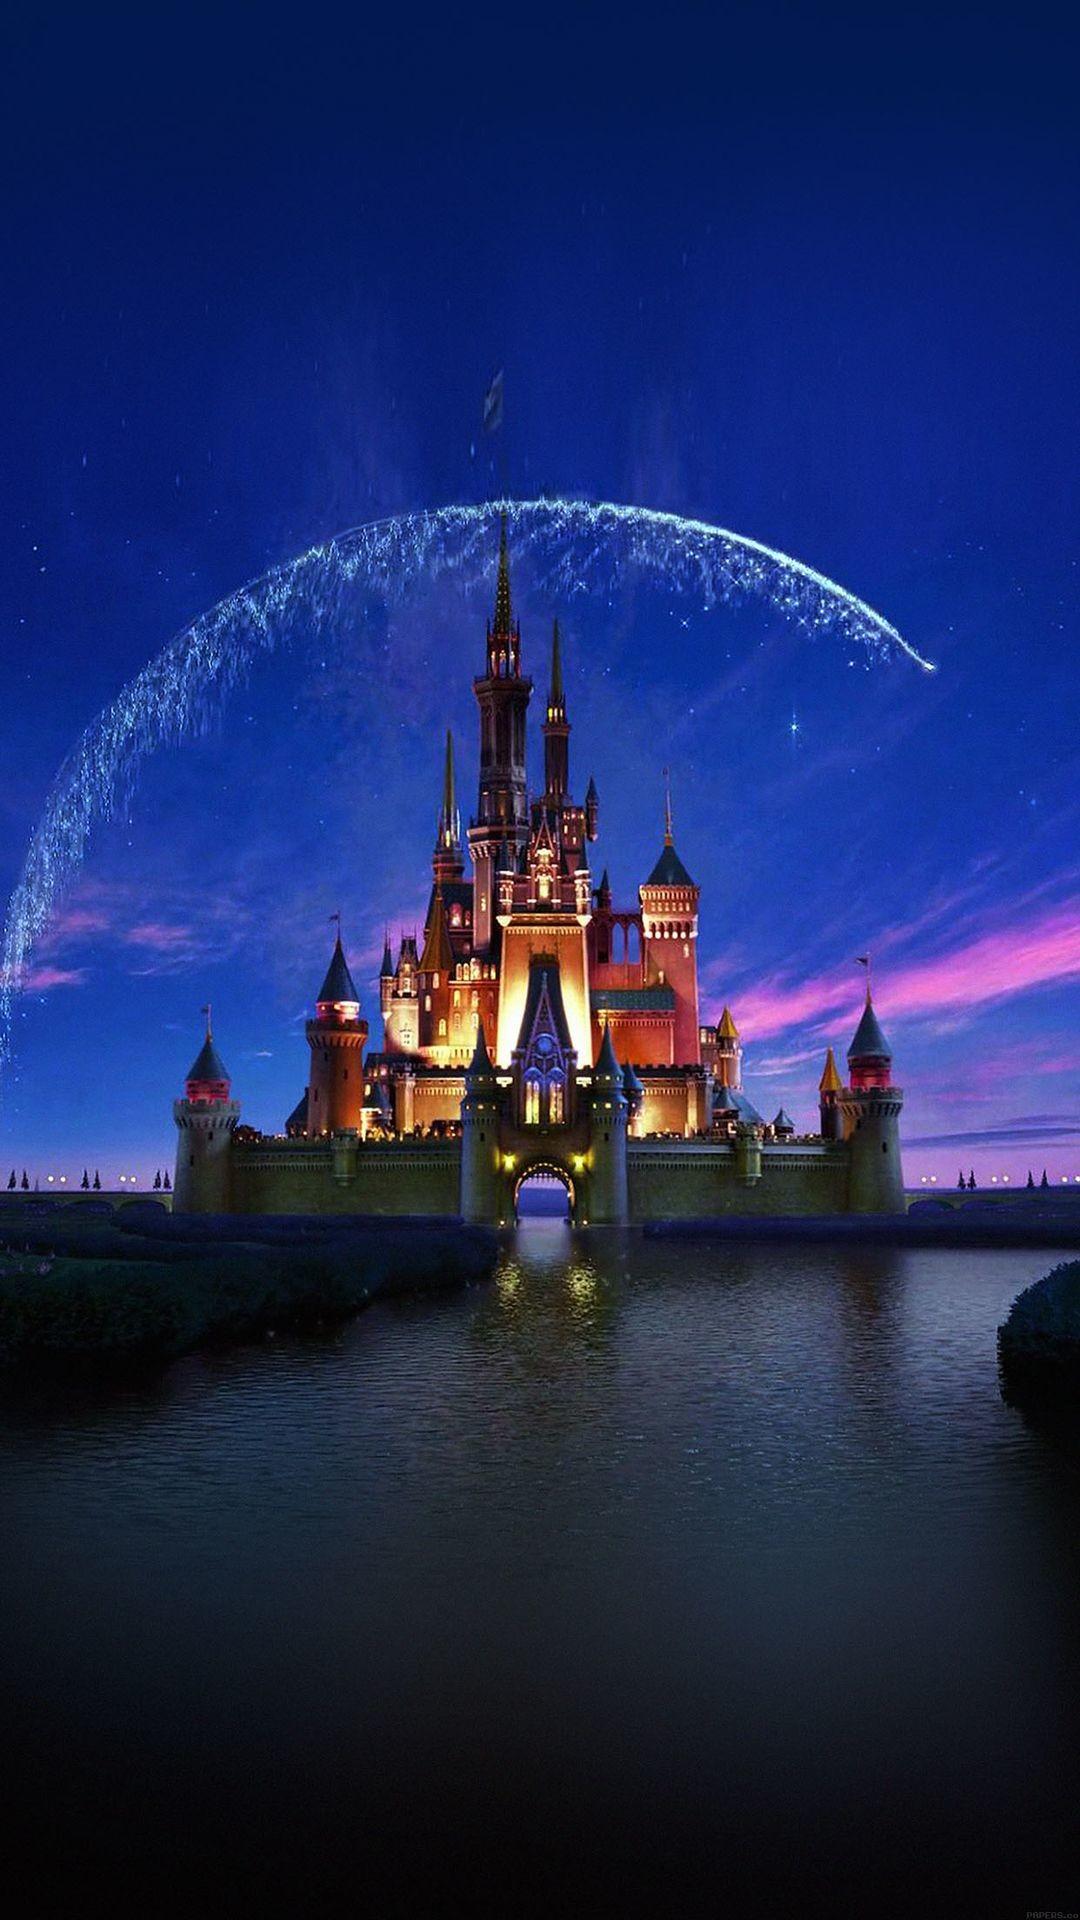 Tap image for more iPhone Disney wallpaper! Disney castle artwork –  @mobile9 | Wallpapers